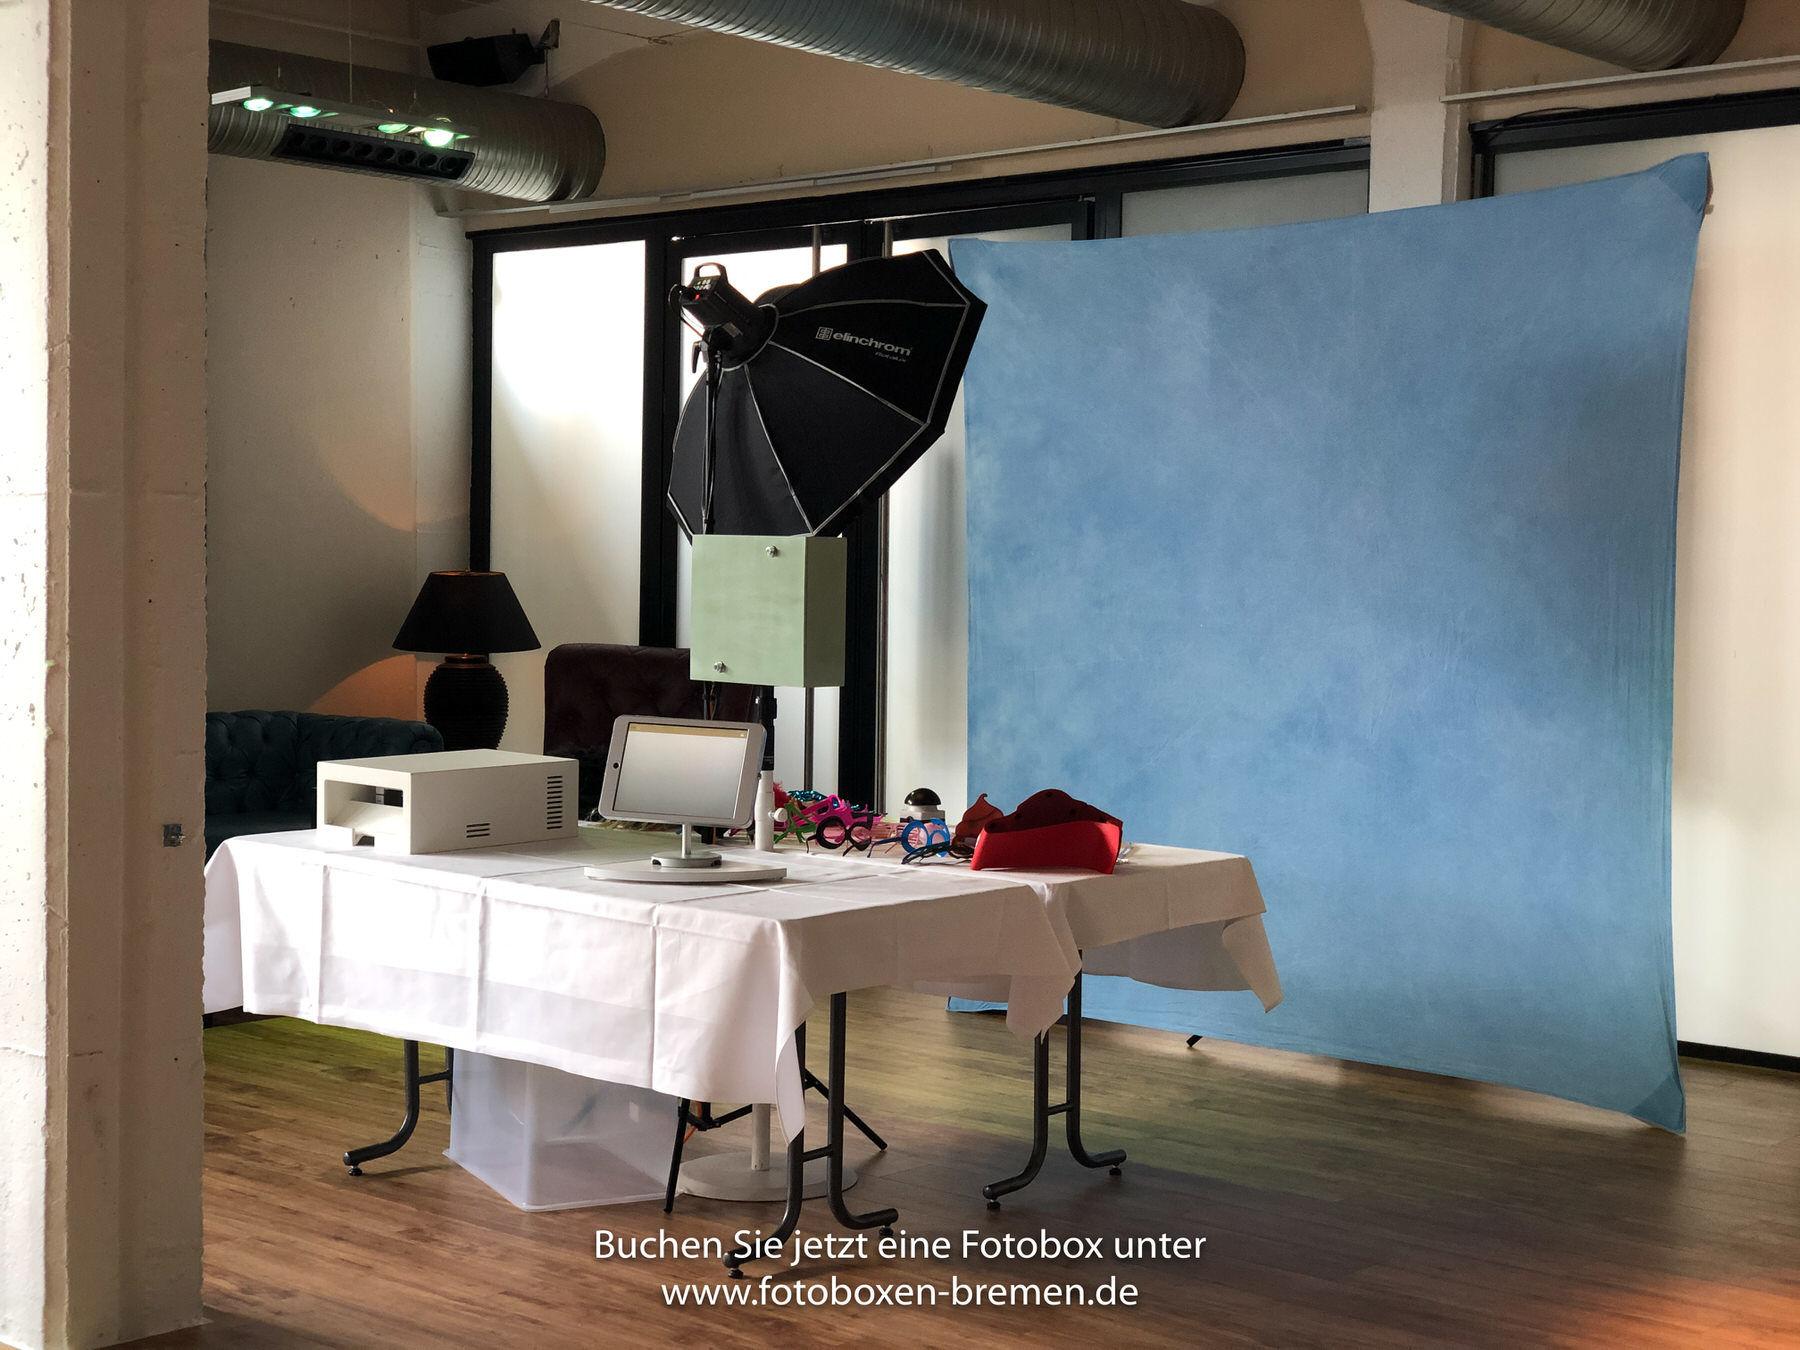 Fotobox bremen mieten 001 - Fotobox Bremen mieten